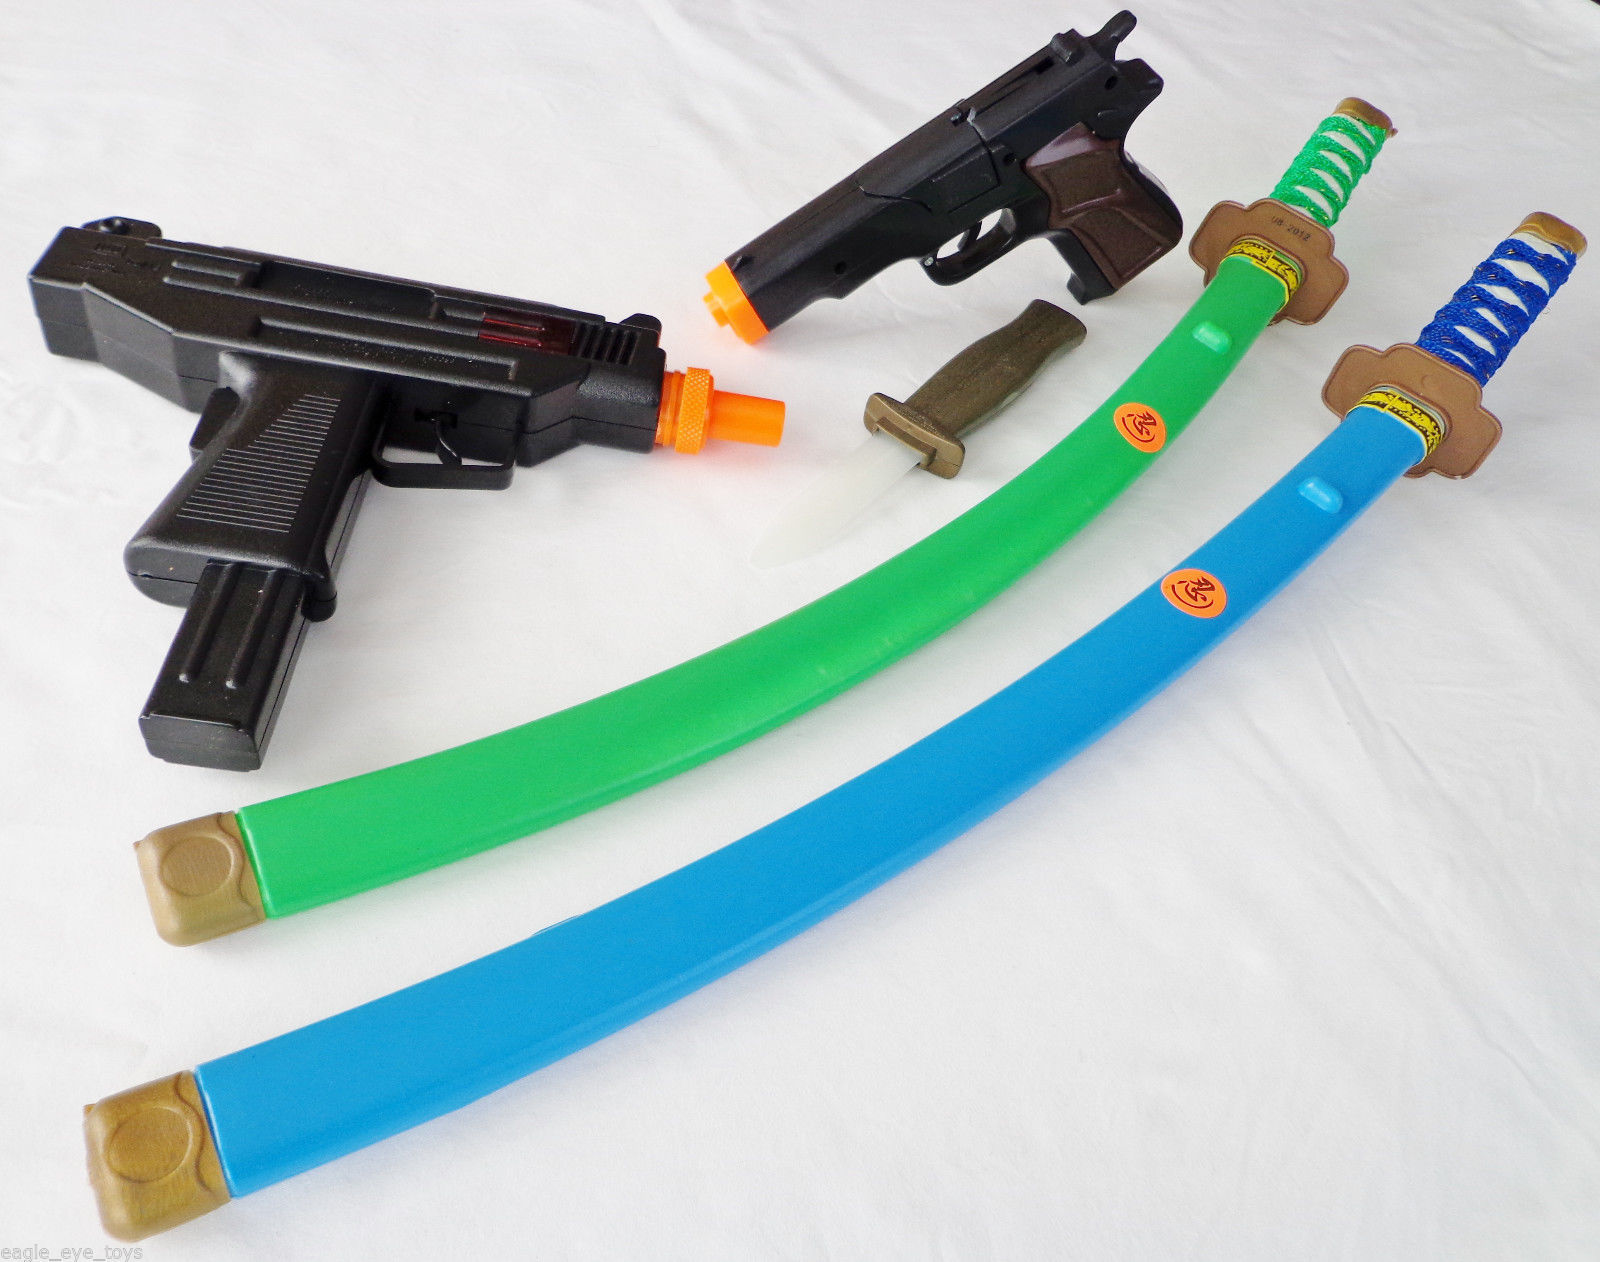 Toy Swords And Guns : Toy uzi machine gun black mm cap guns katana ninja